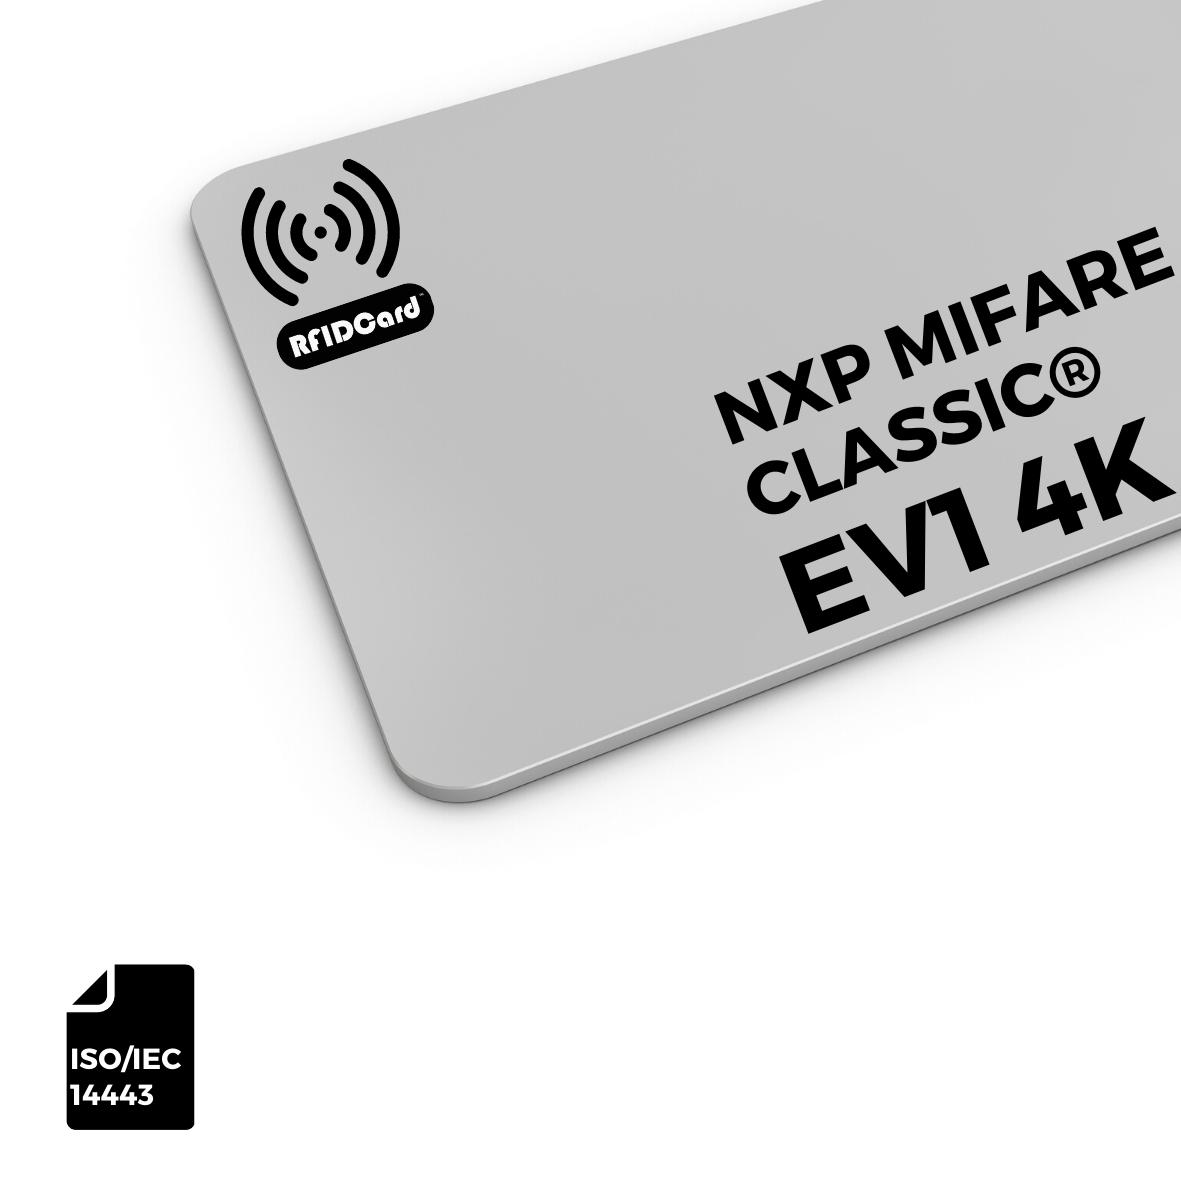 RFID Card NXP MIFARE Classic®EV1 4k